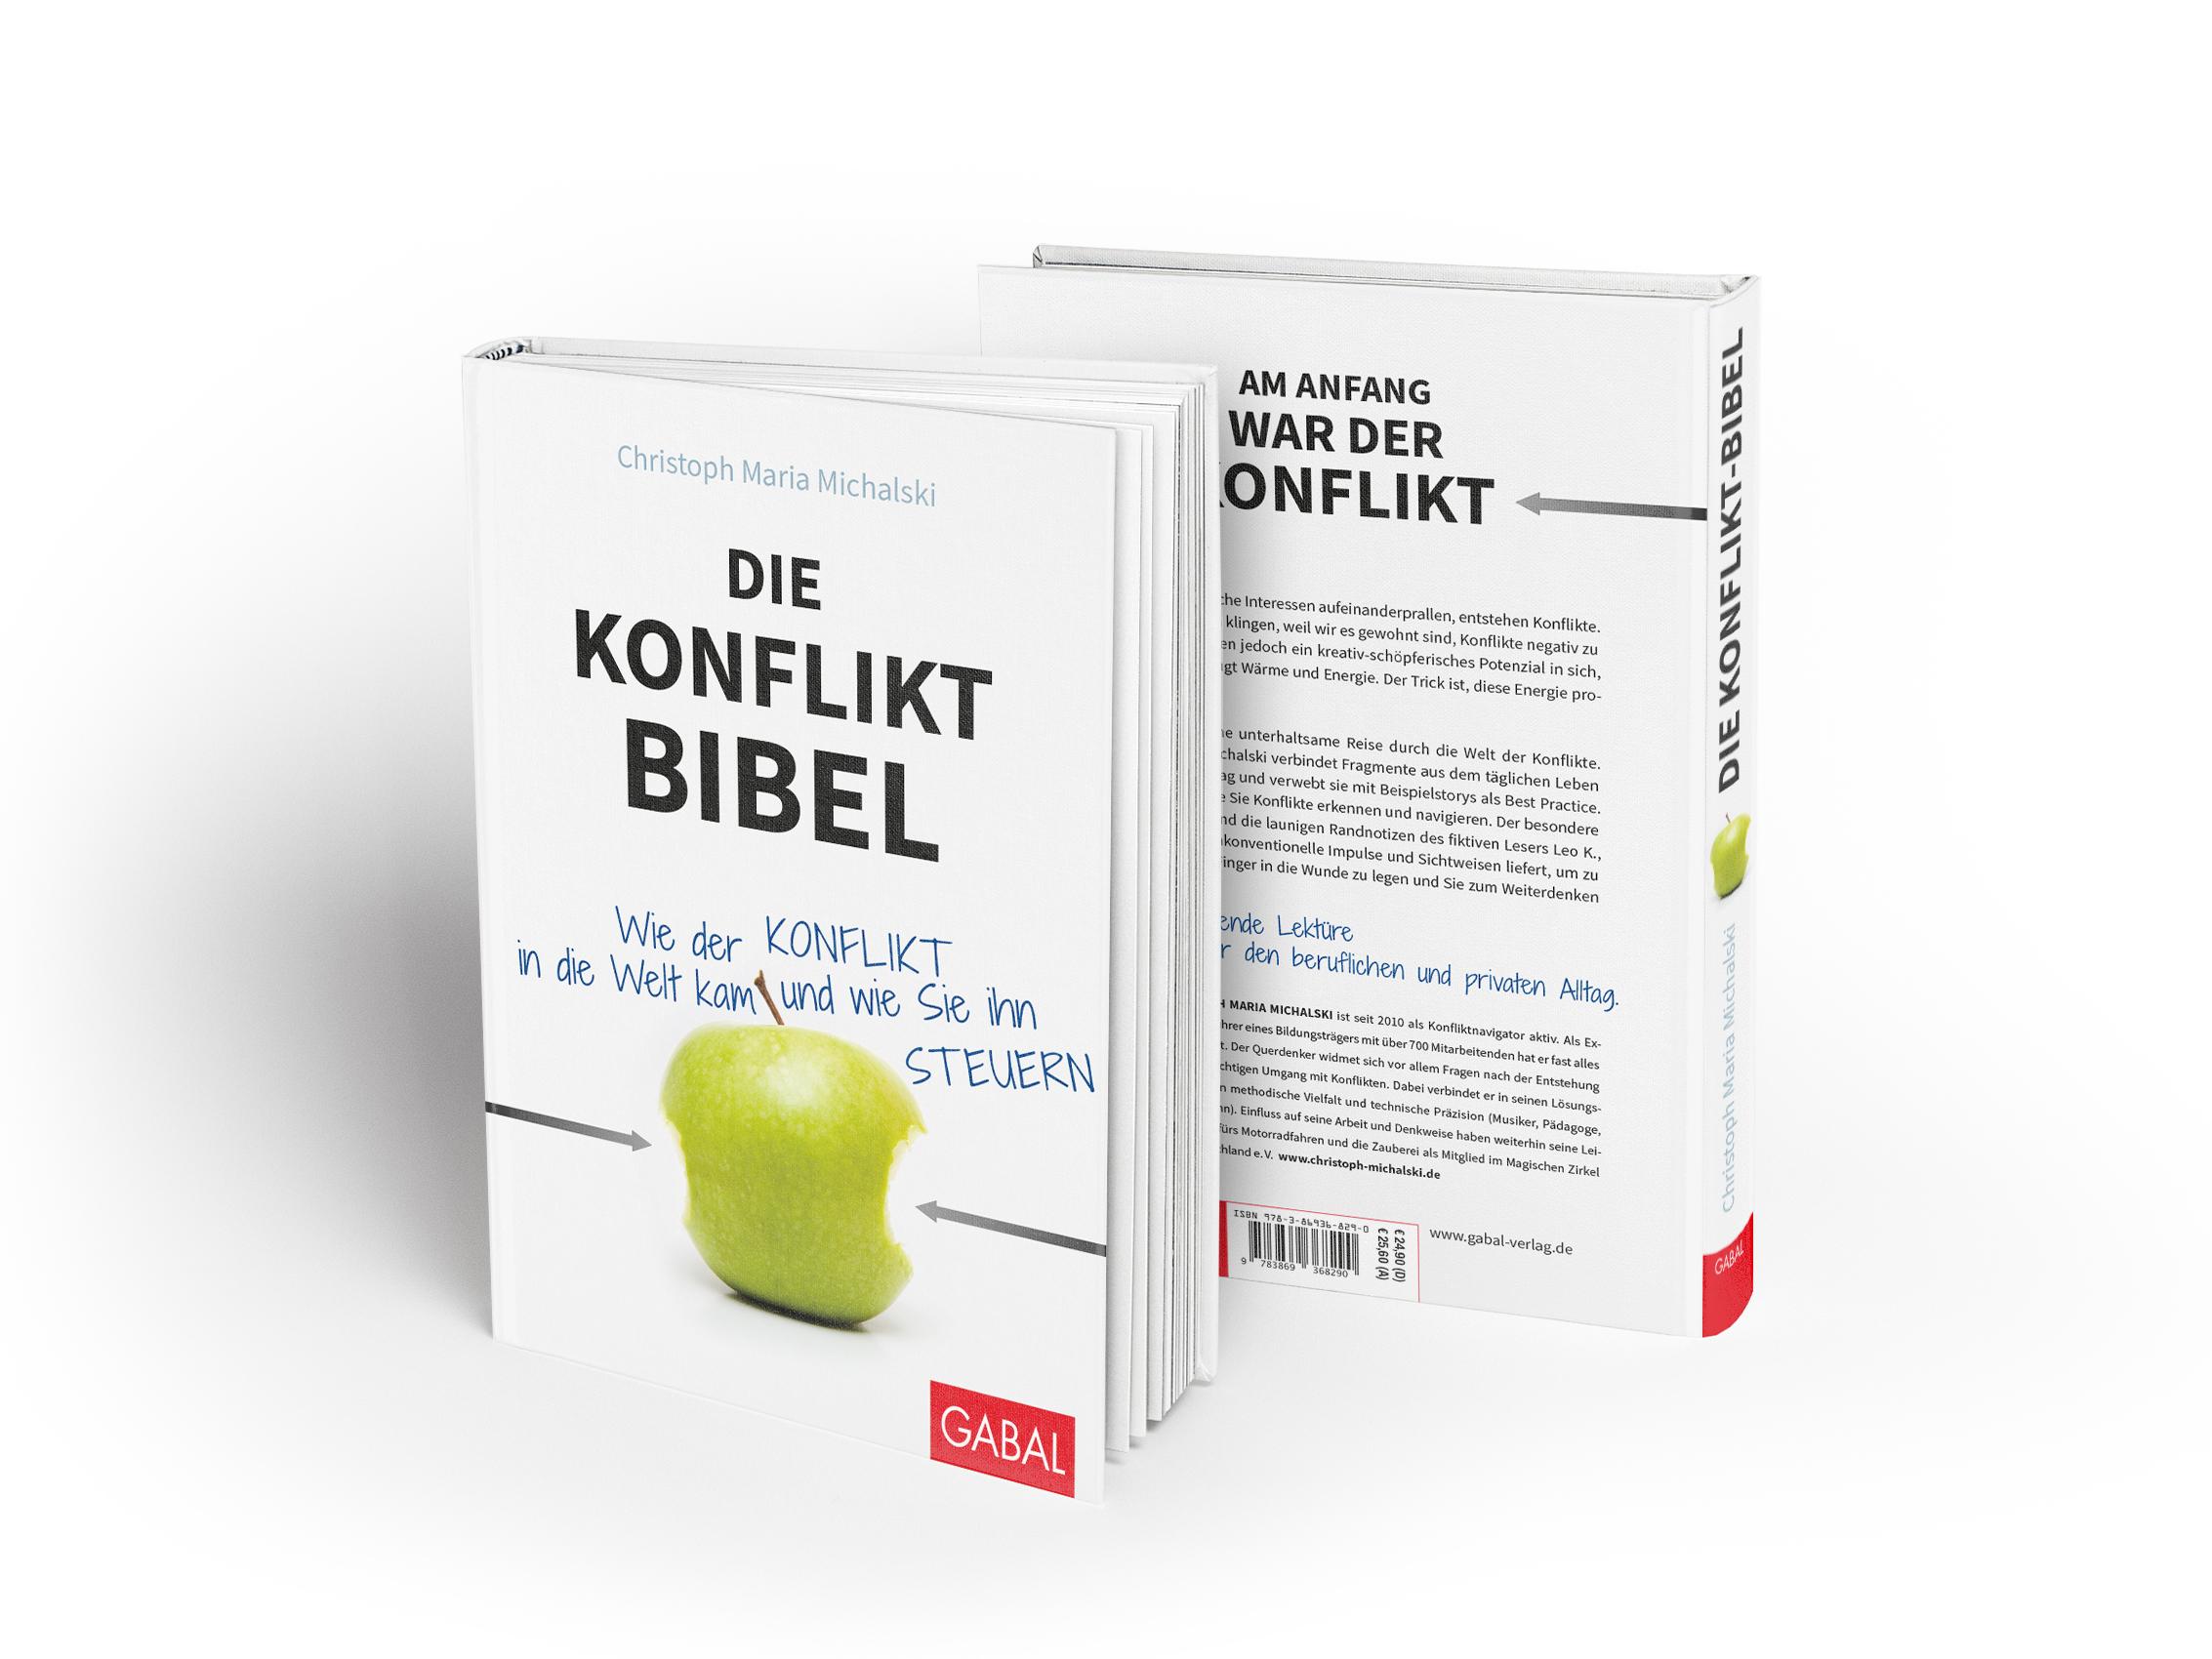 martin zech design, buchcover gestaltung, gabal verlag, christoph maria michalski, konflikt-bibel